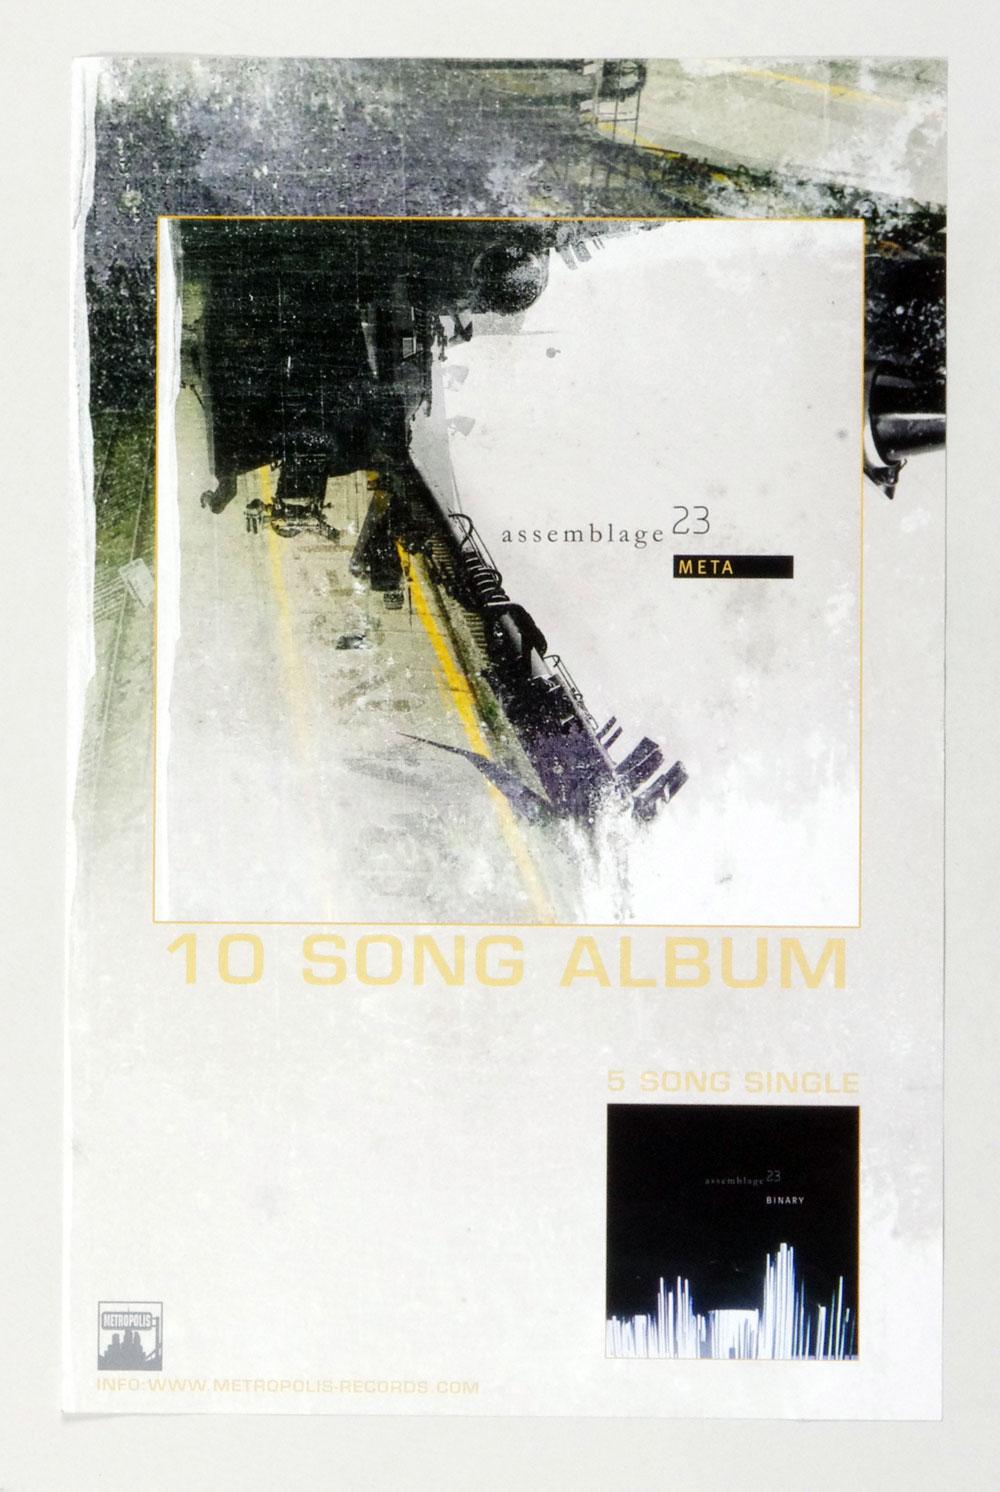 Assemblage 23 Poster META 2007 New Album Promo 11 x 17 1 side